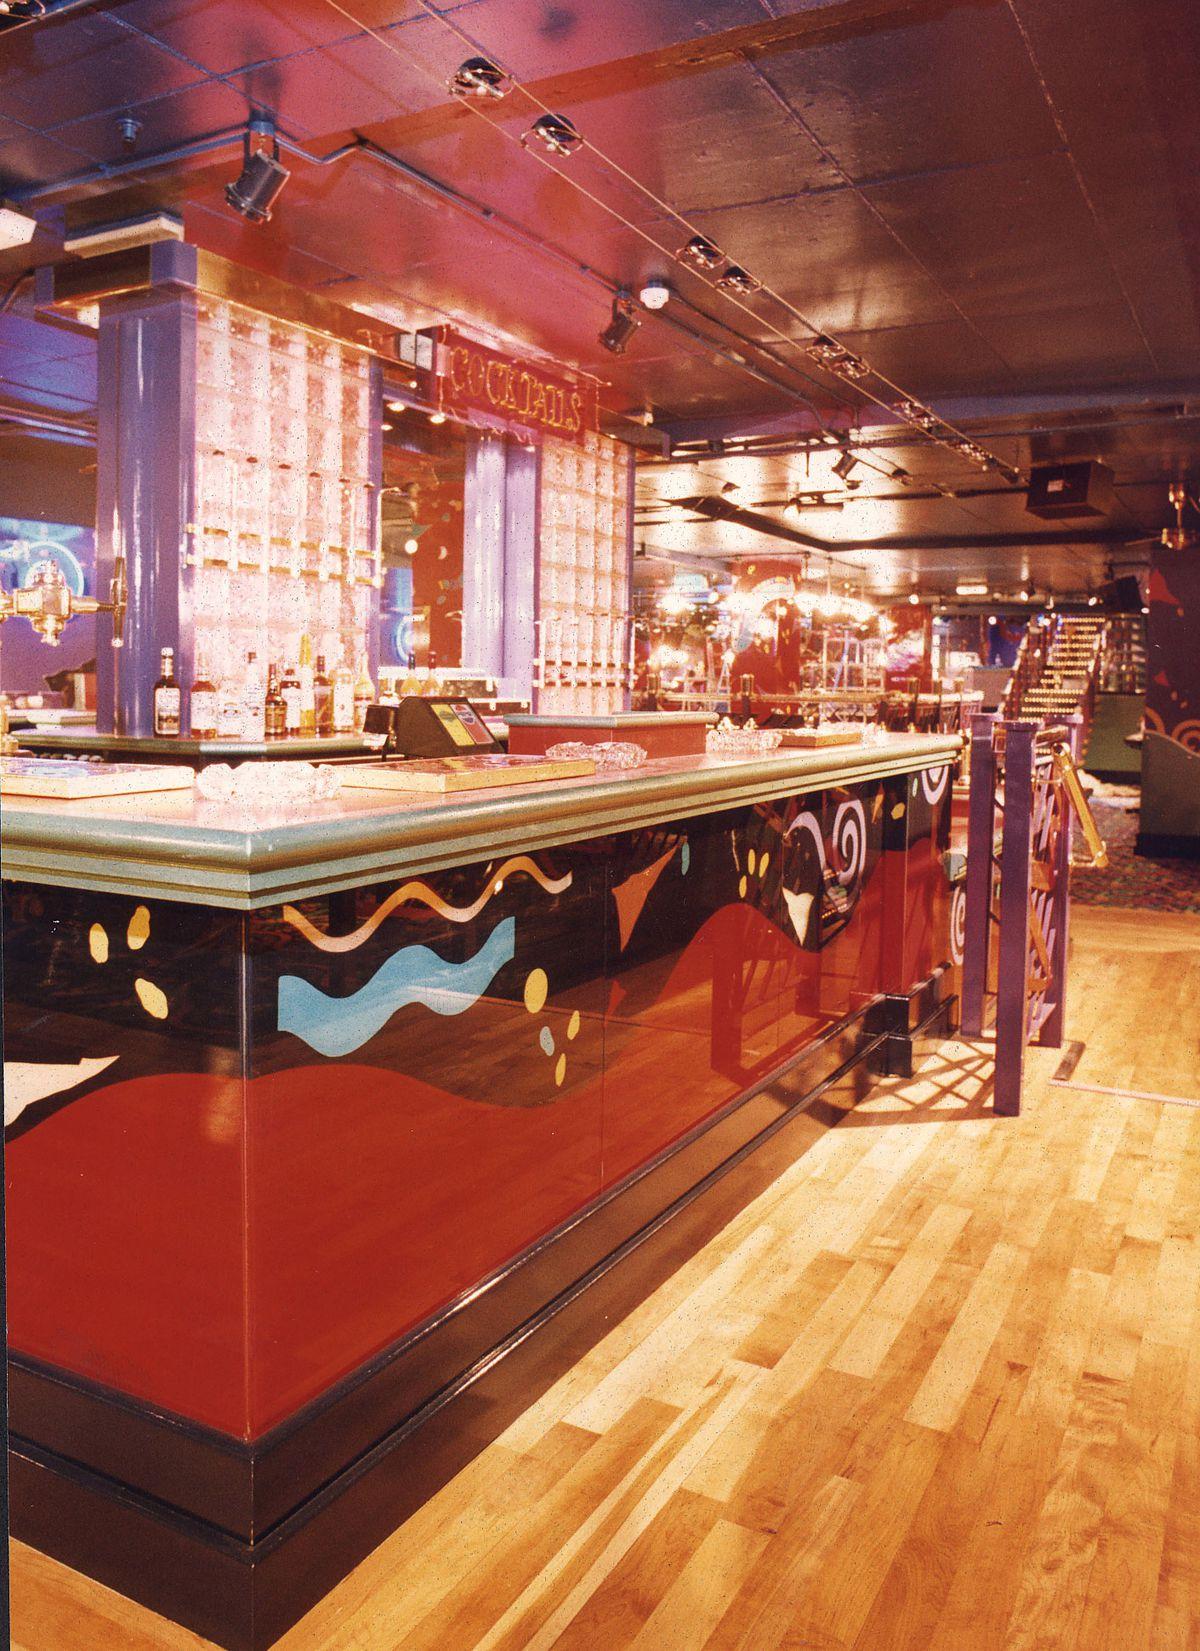 The cocktail bar at Cascades.